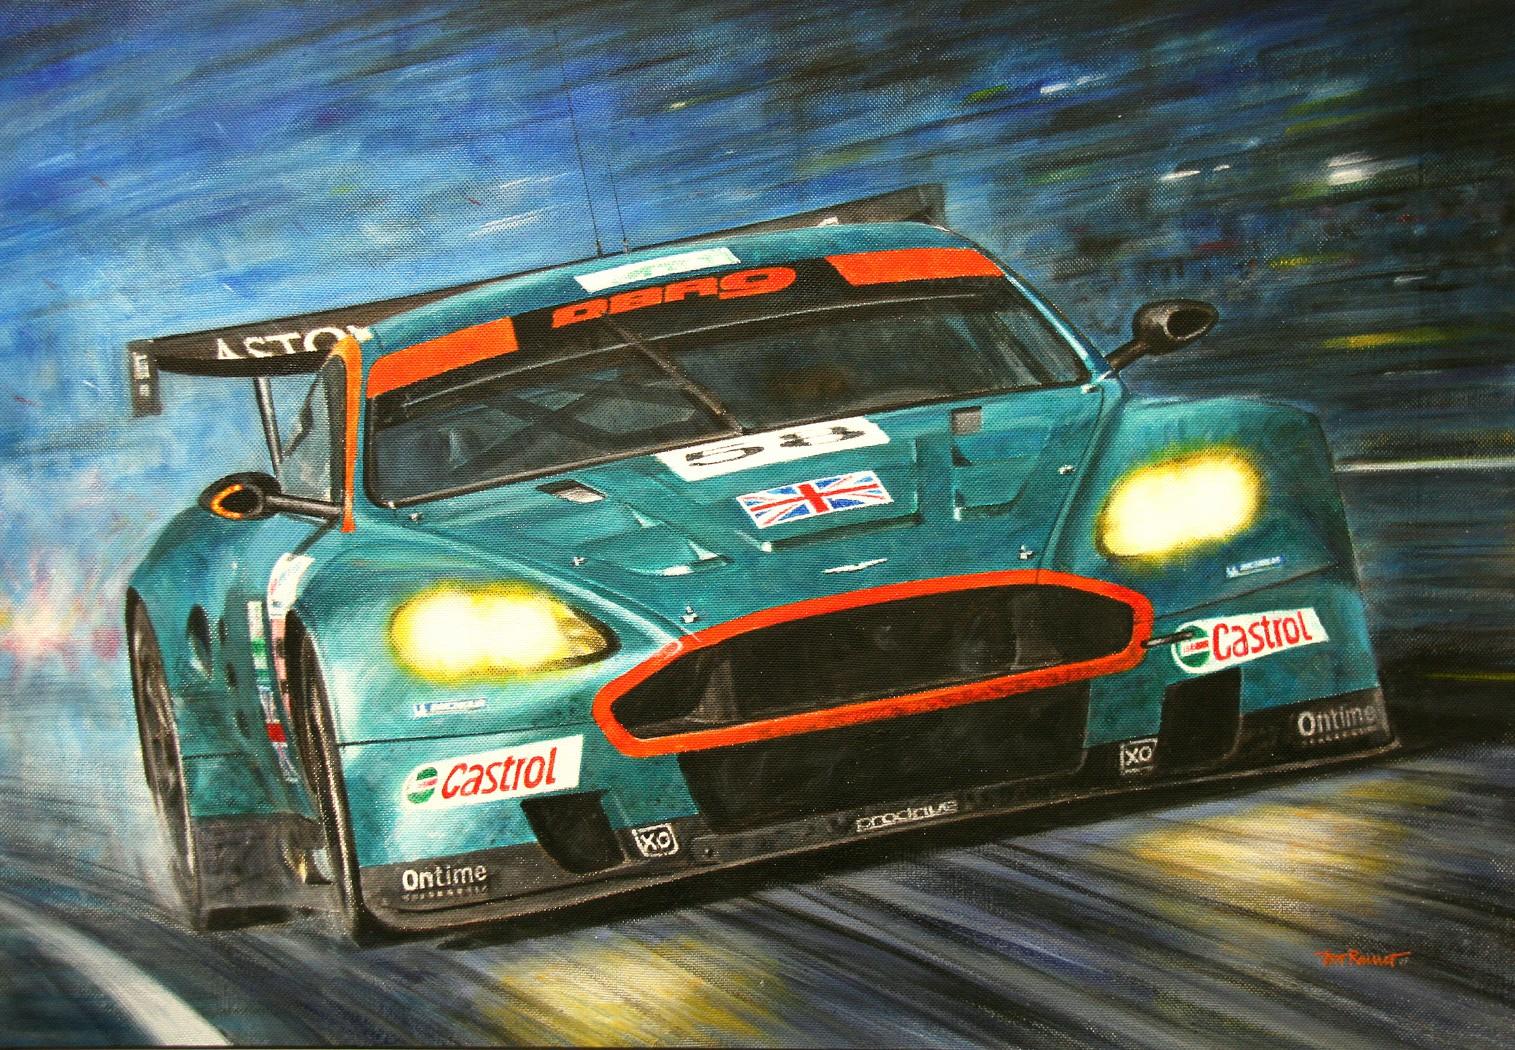 Aston Martin DBR9 - 24h Le Mans 2005